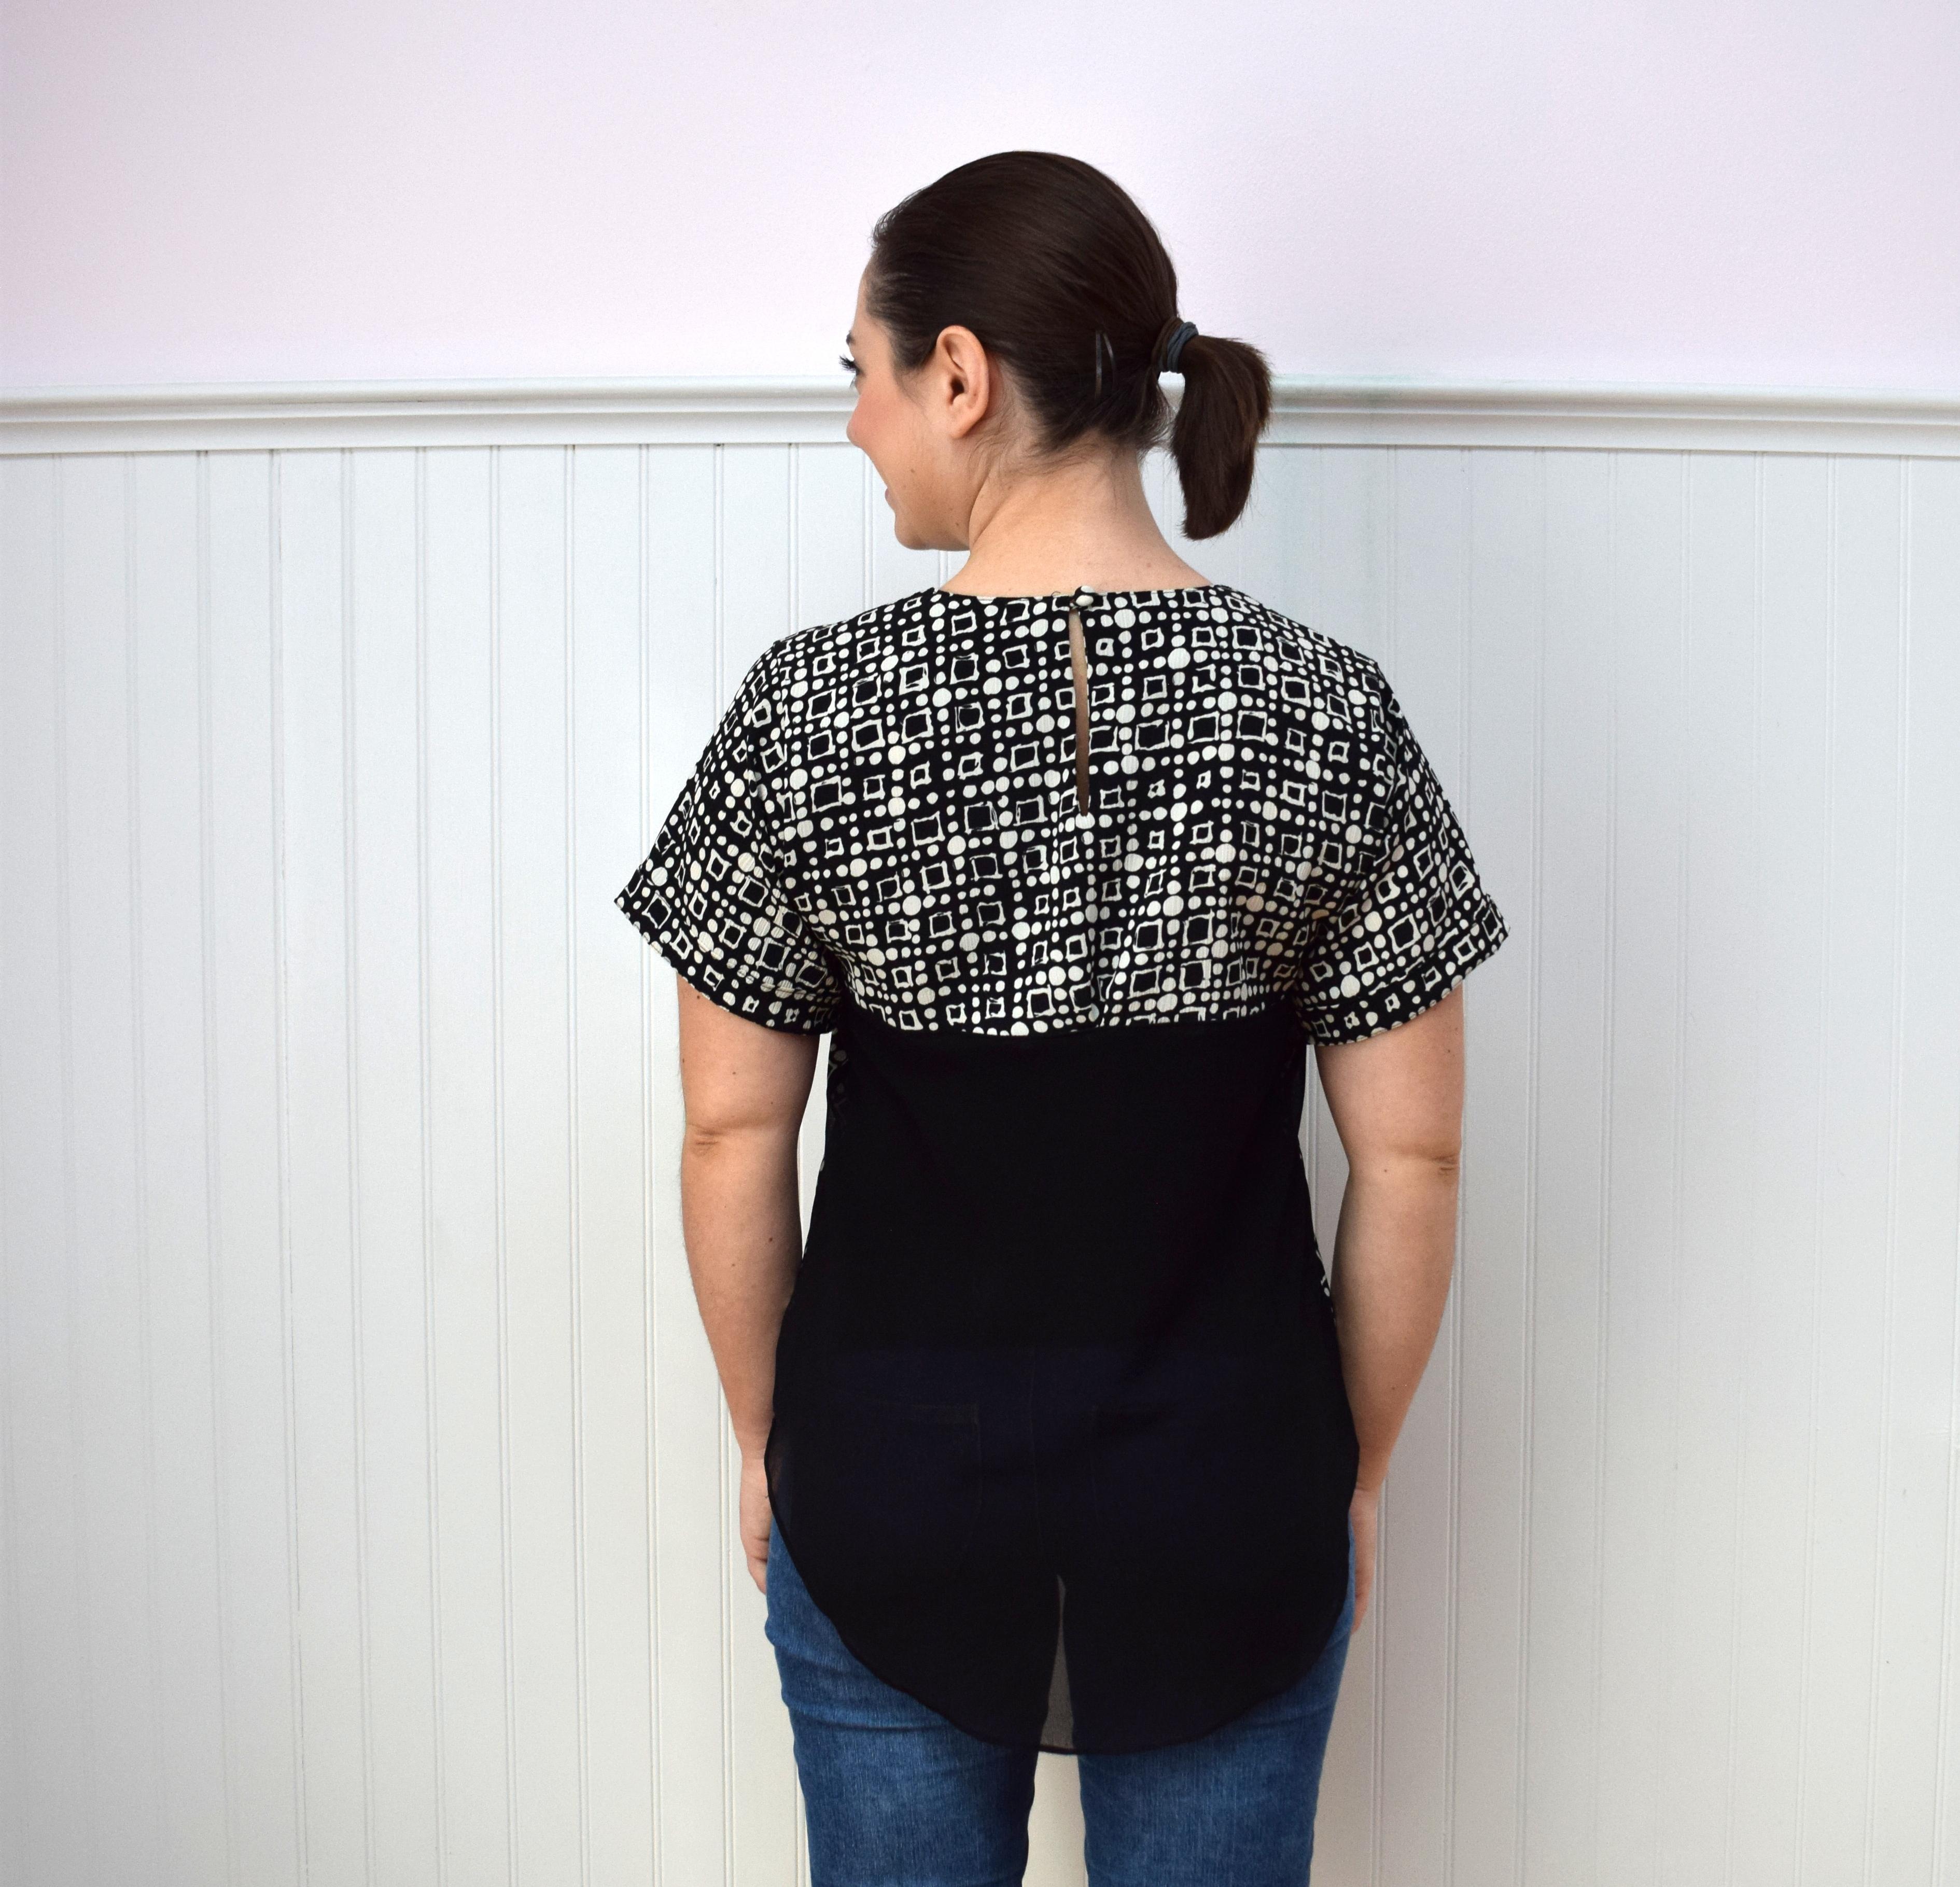 #RefashionFriday Easy Top Refashion - Trish Stitched